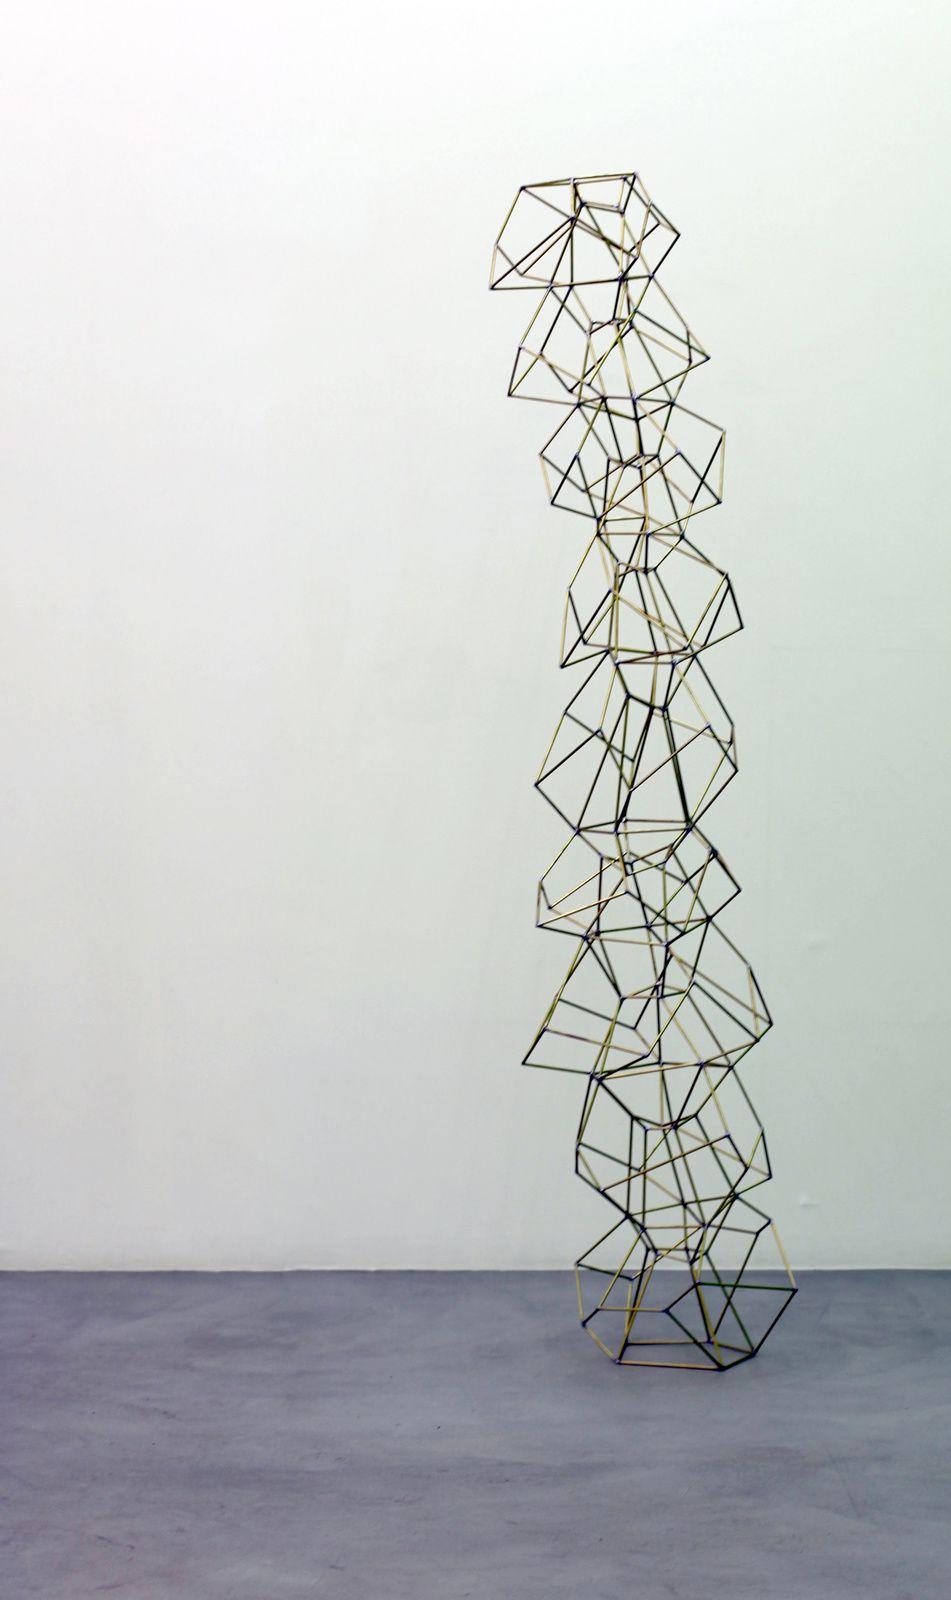 """9- stöckiger Dodekaeder"", 2016 de Beat ZODERER - Courtesy Galerie Semiose © Photo Éric Simon"